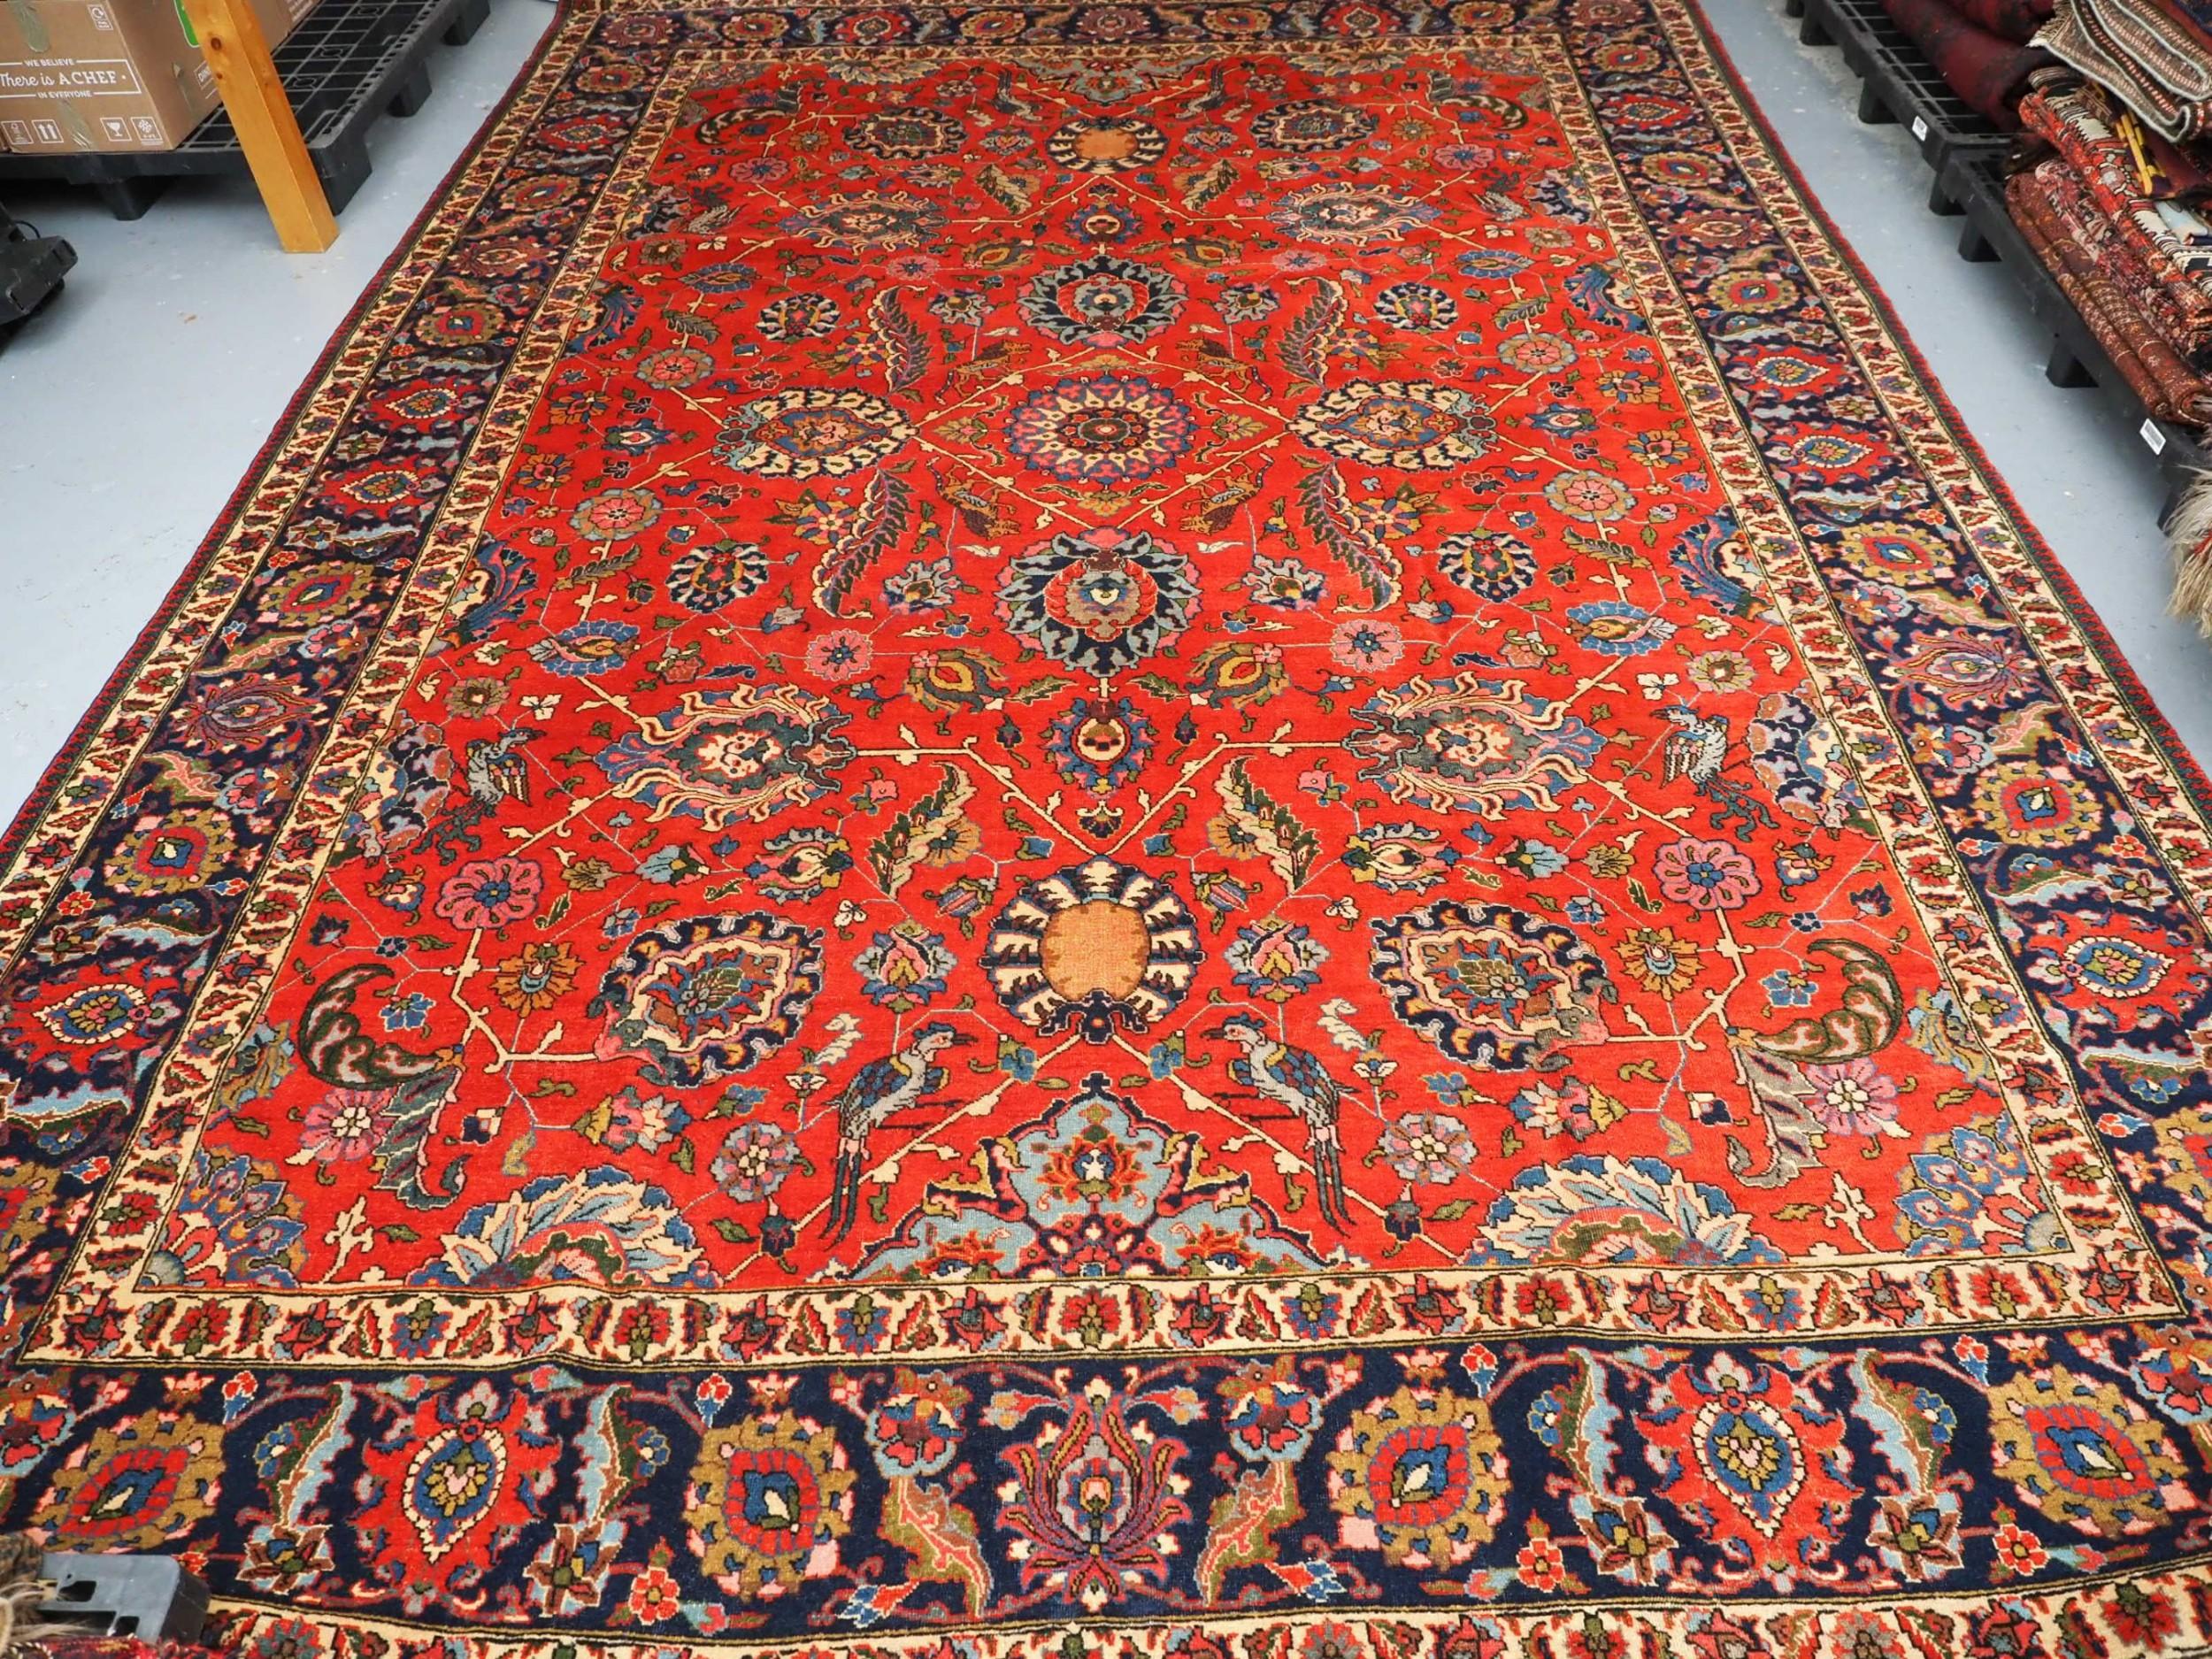 antique tabriz carpet with birds and lions excellent condition circa 190020